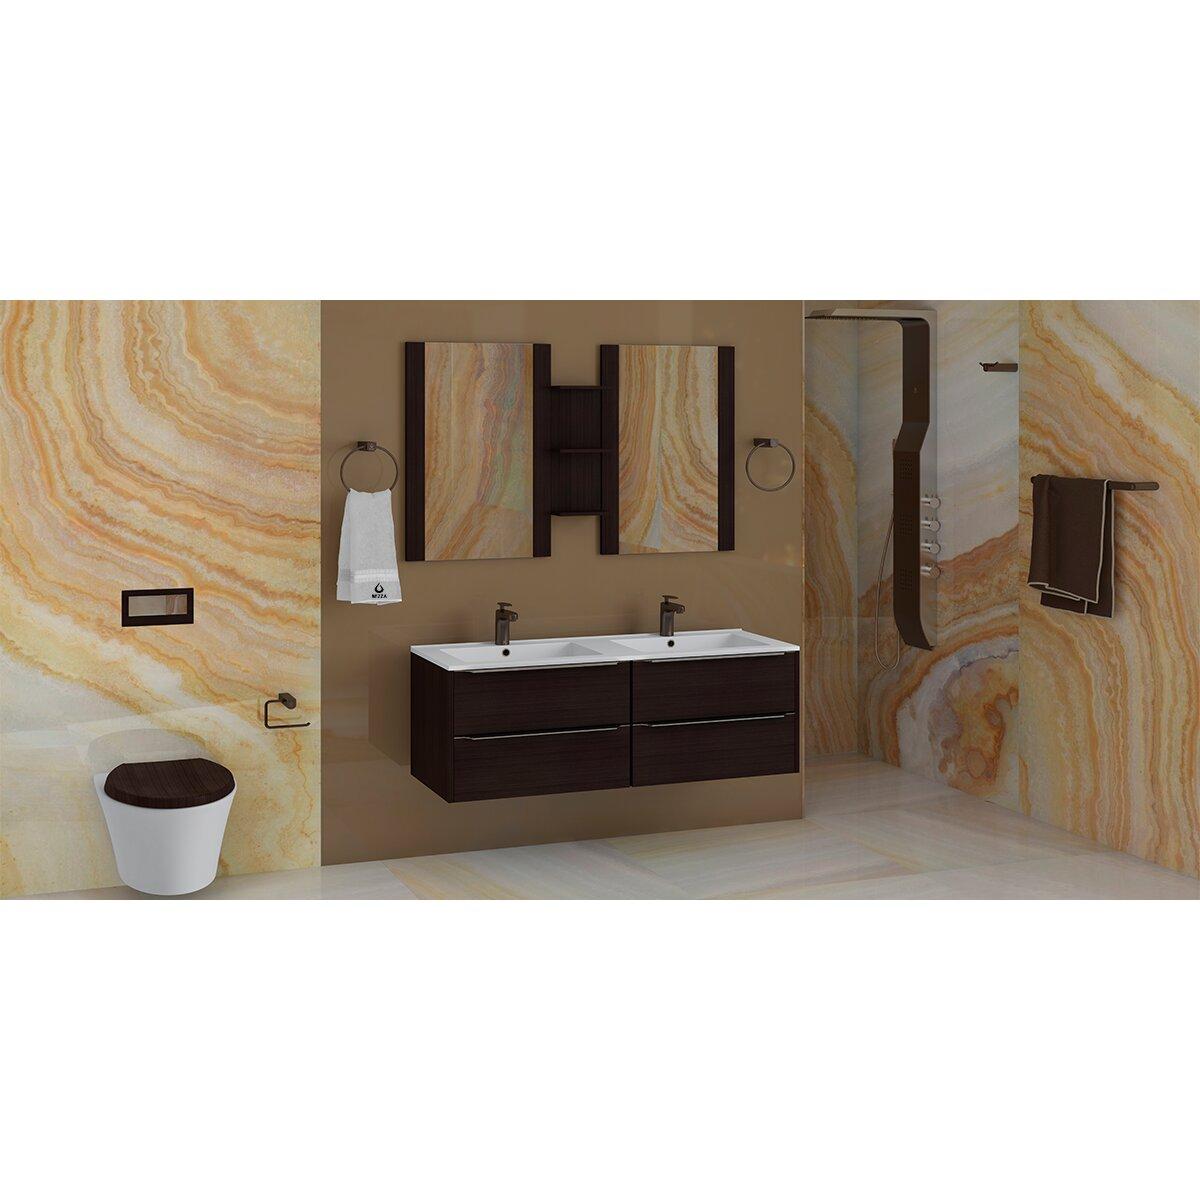 Nezza 4 piece bathroom hardware set wayfair for Bathroom 4 piece set